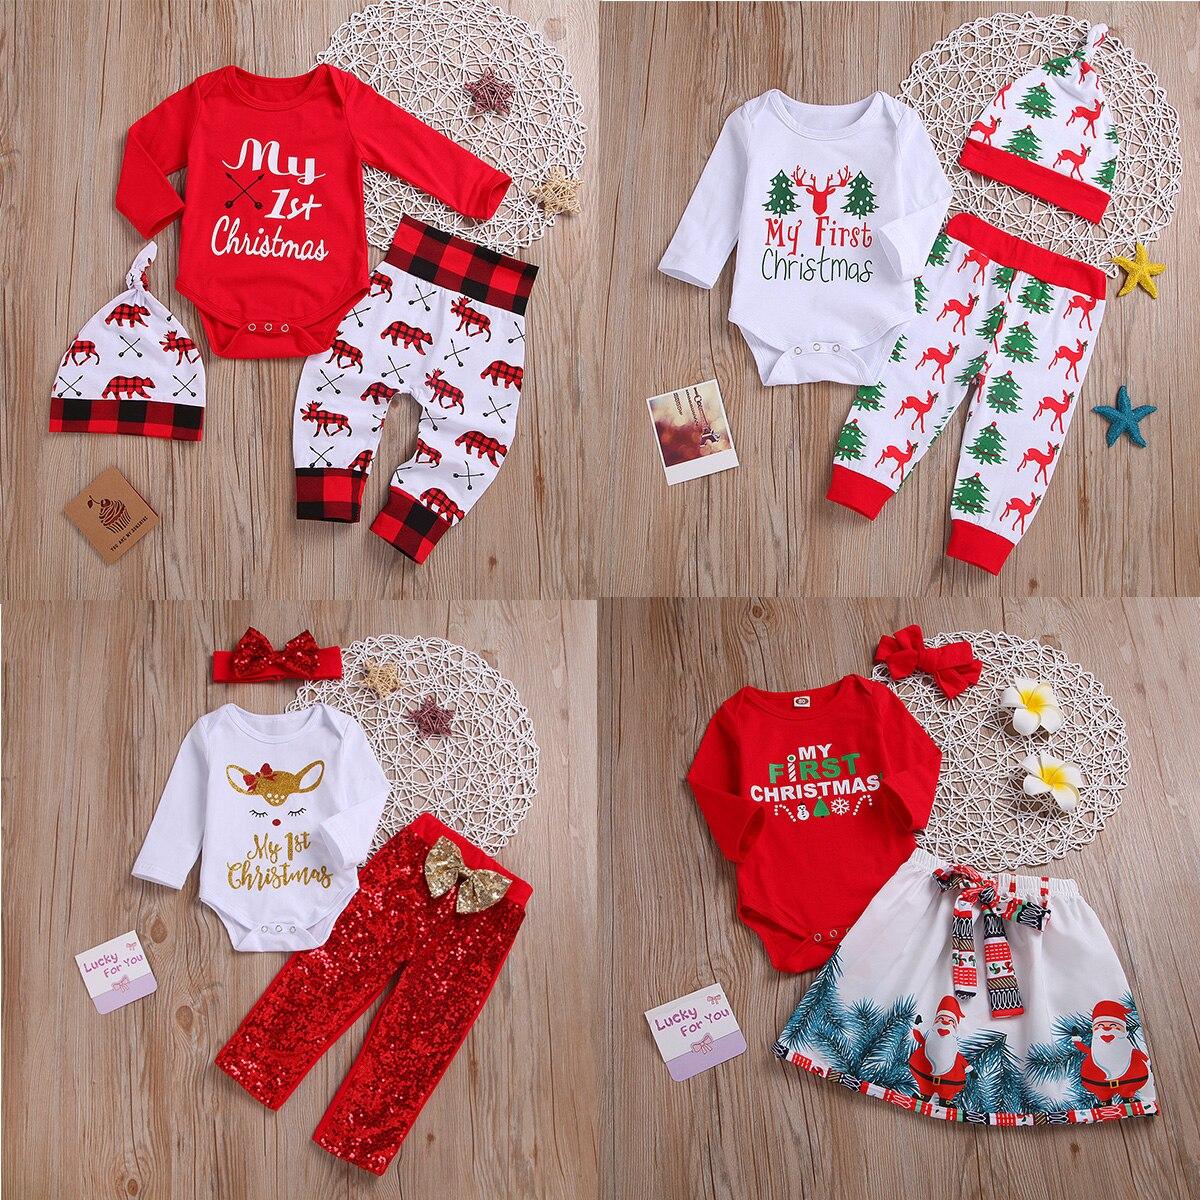 Toddler Baby Girls Christmas Clothes Outfits Set 1-5 Years Old 3Pcs Kids Cartoon Santa Dress Pants Headbands